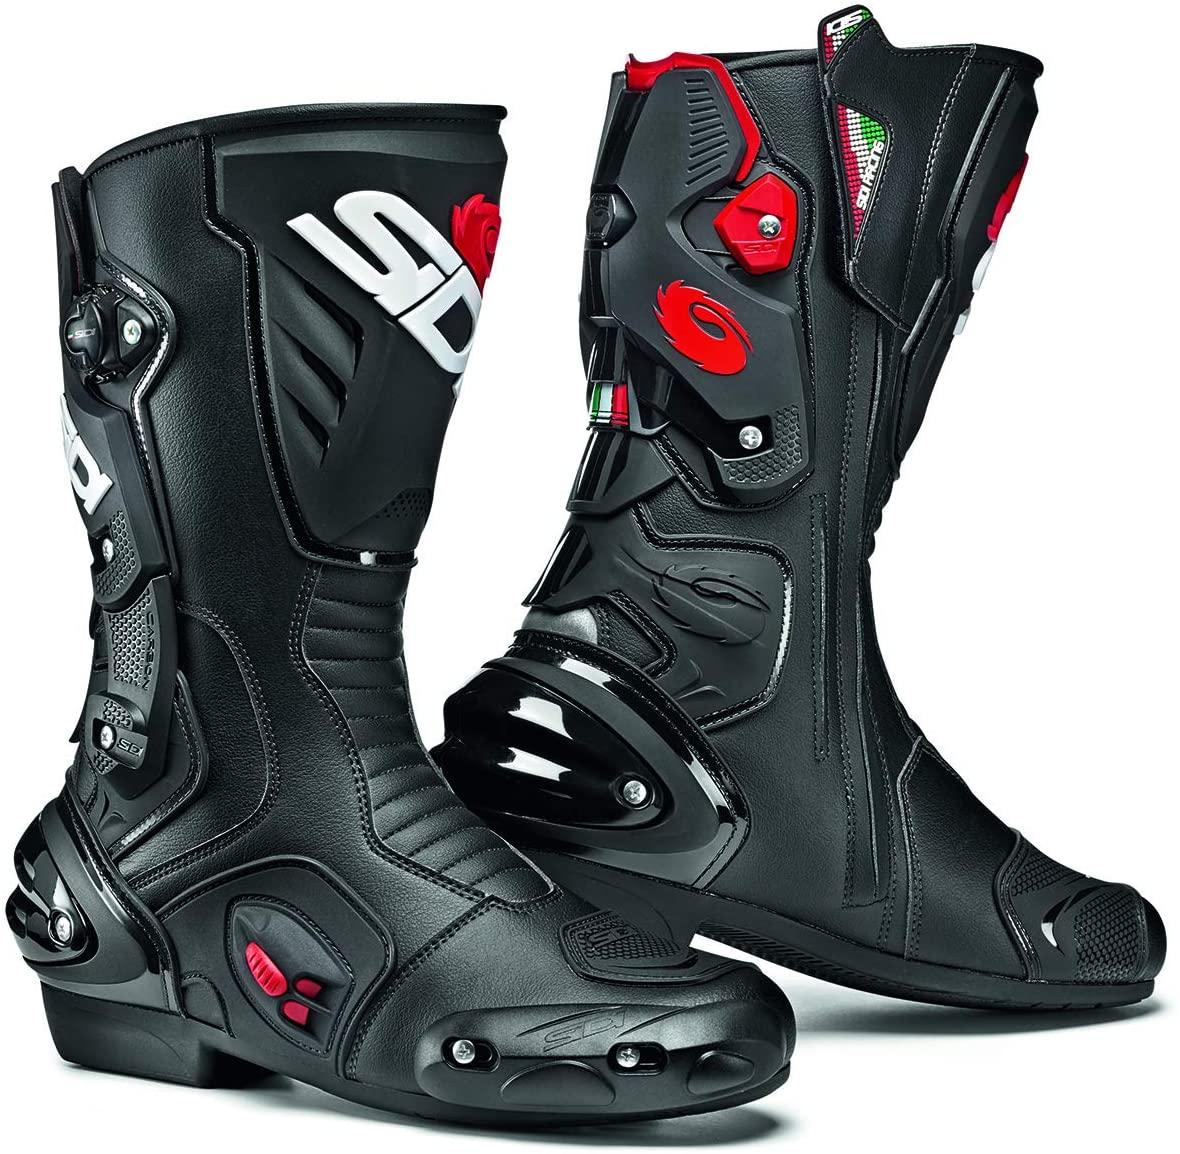 Sidi Vertigo 2 Motorcycle Boots (10/44, Black)